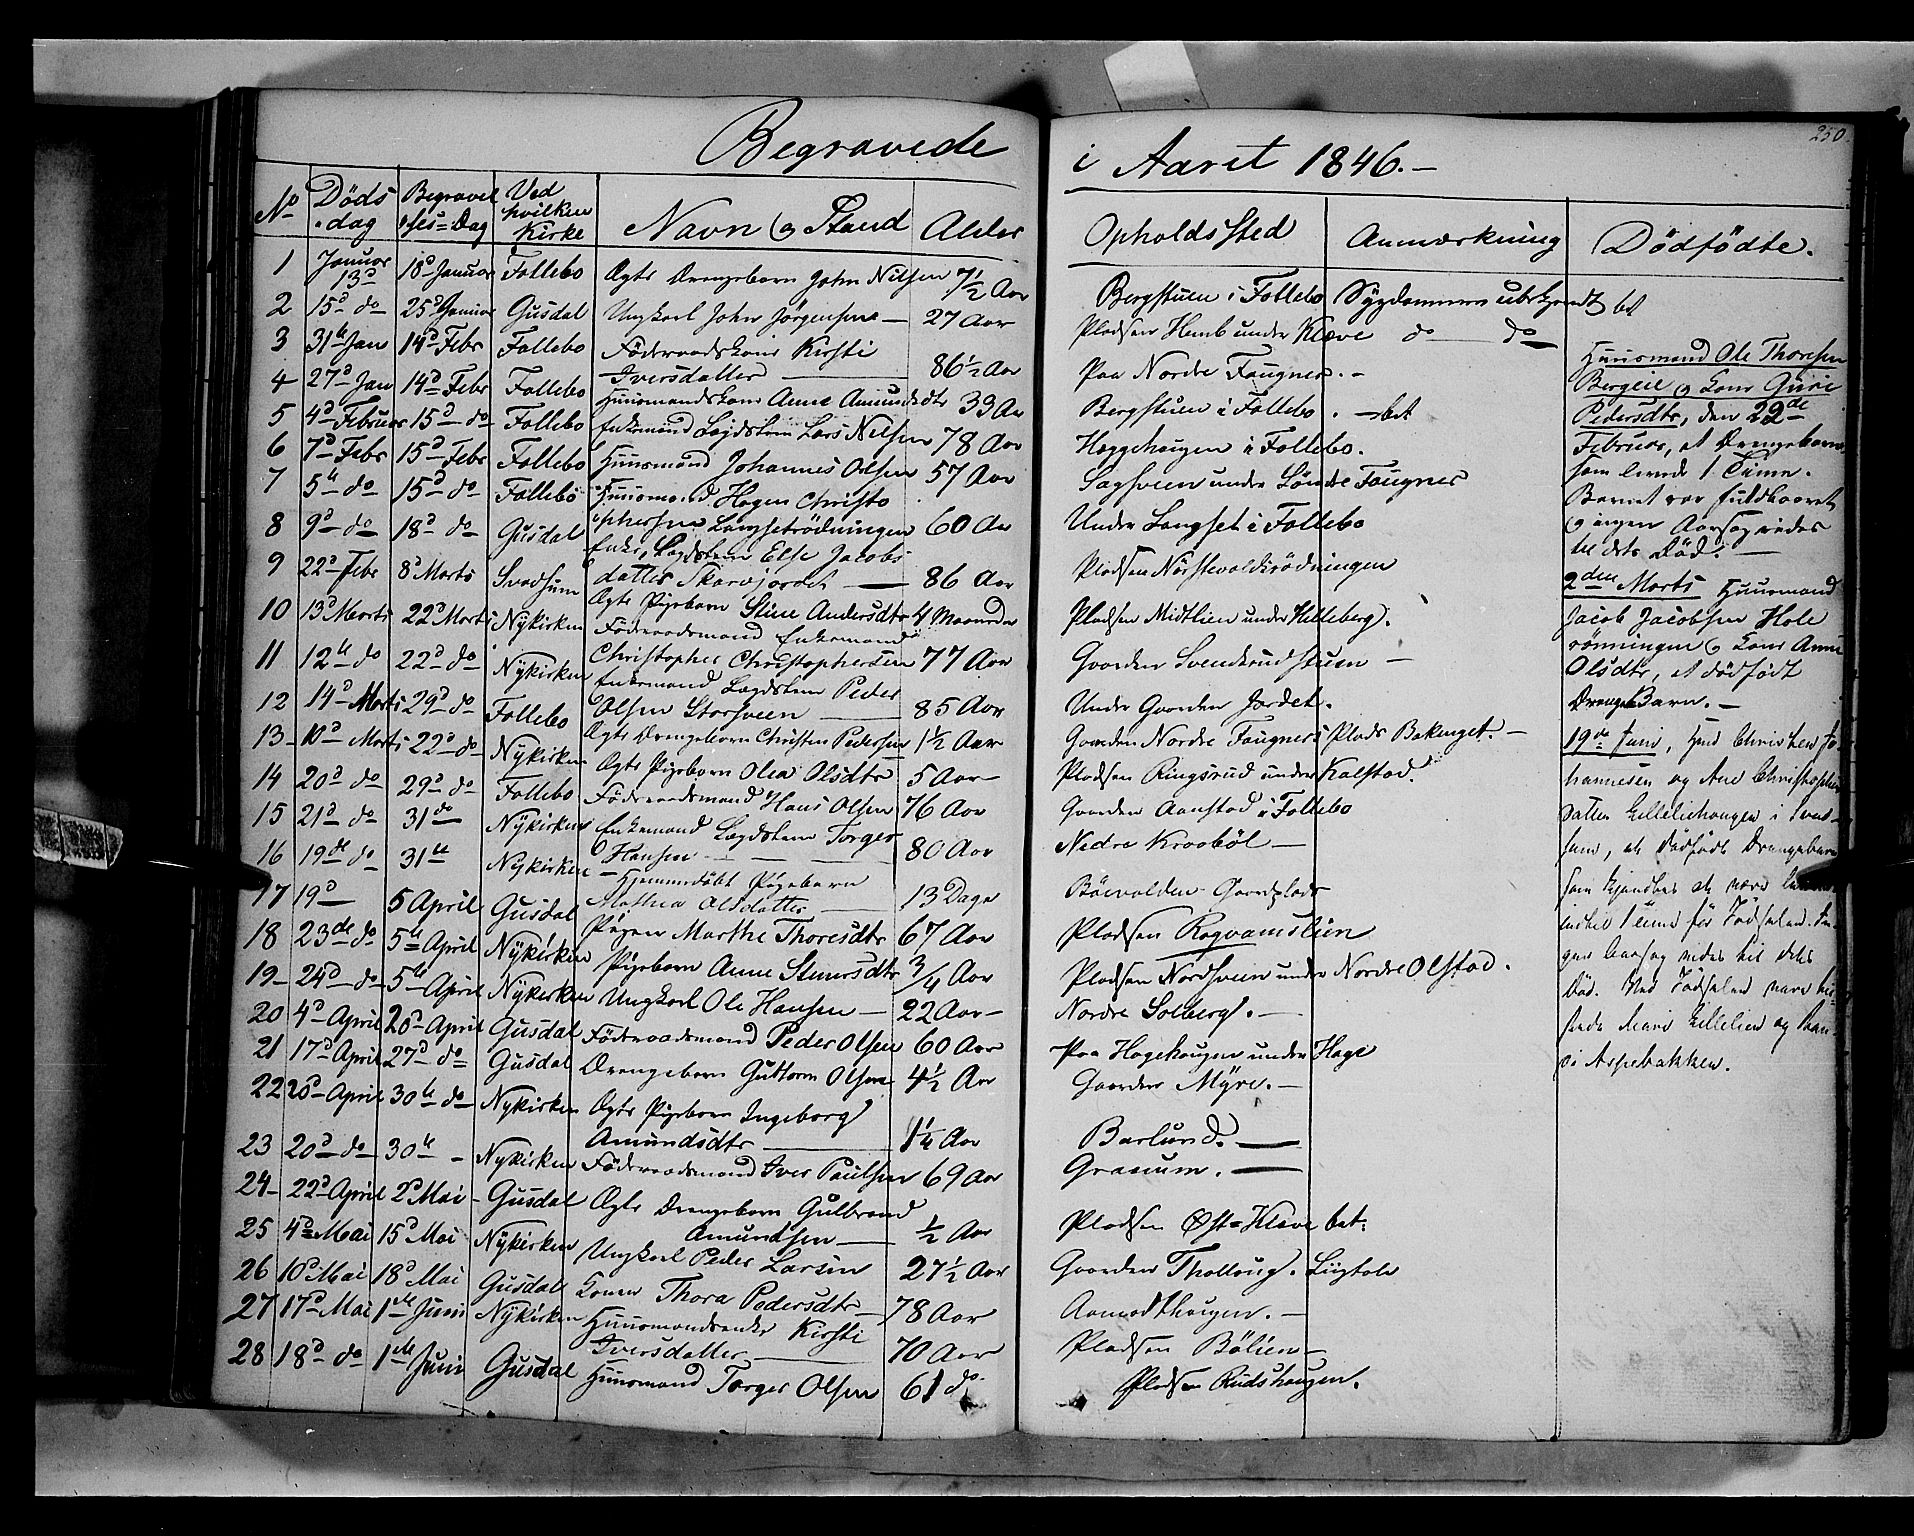 SAH, Gausdal prestekontor, Ministerialbok nr. 7, 1840-1850, s. 250